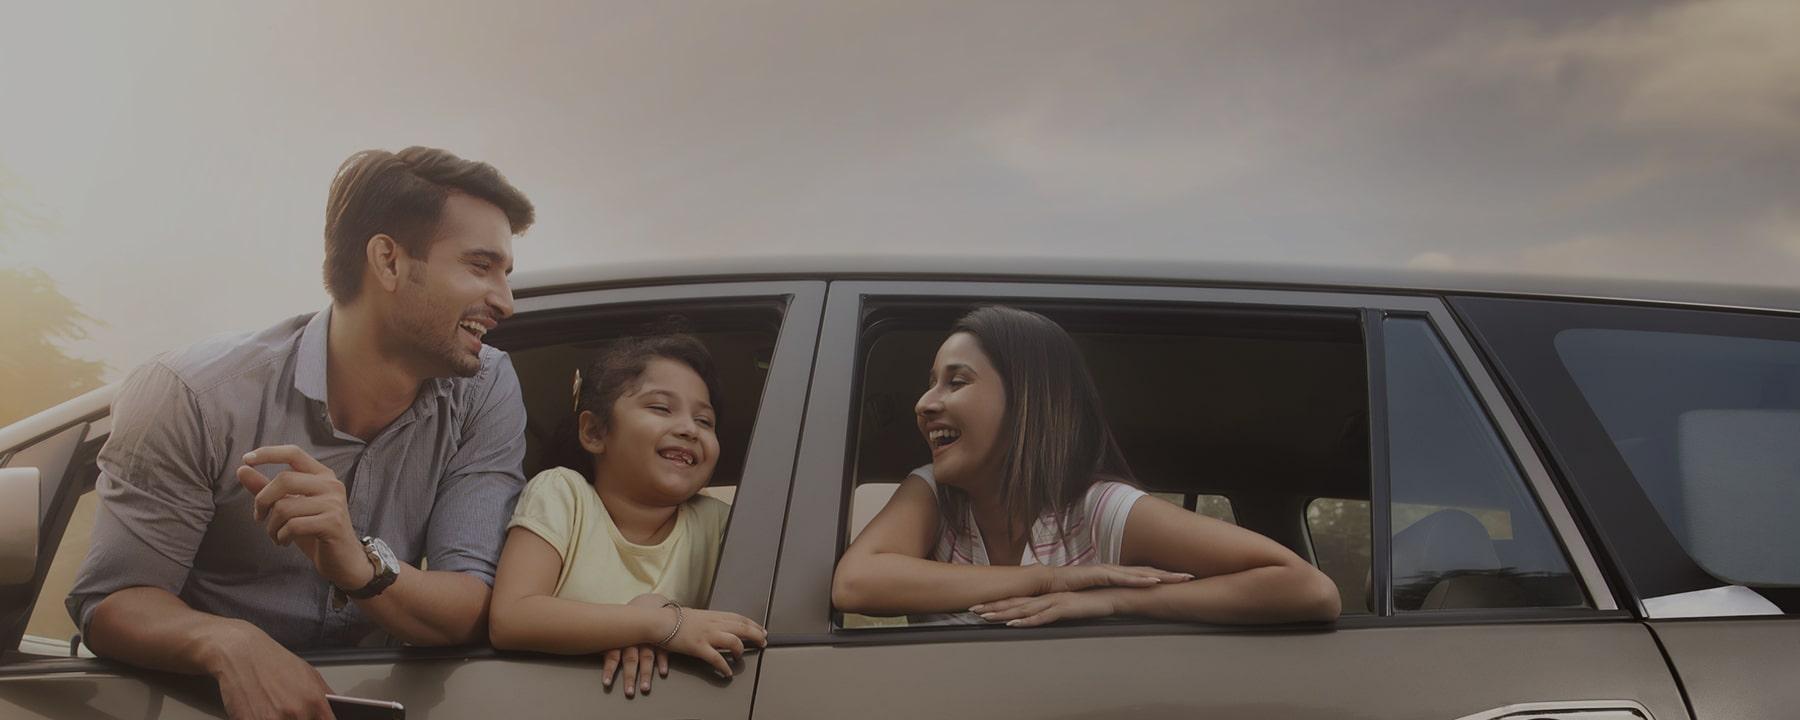 Auto de Prymera: Tu crédito vehicular